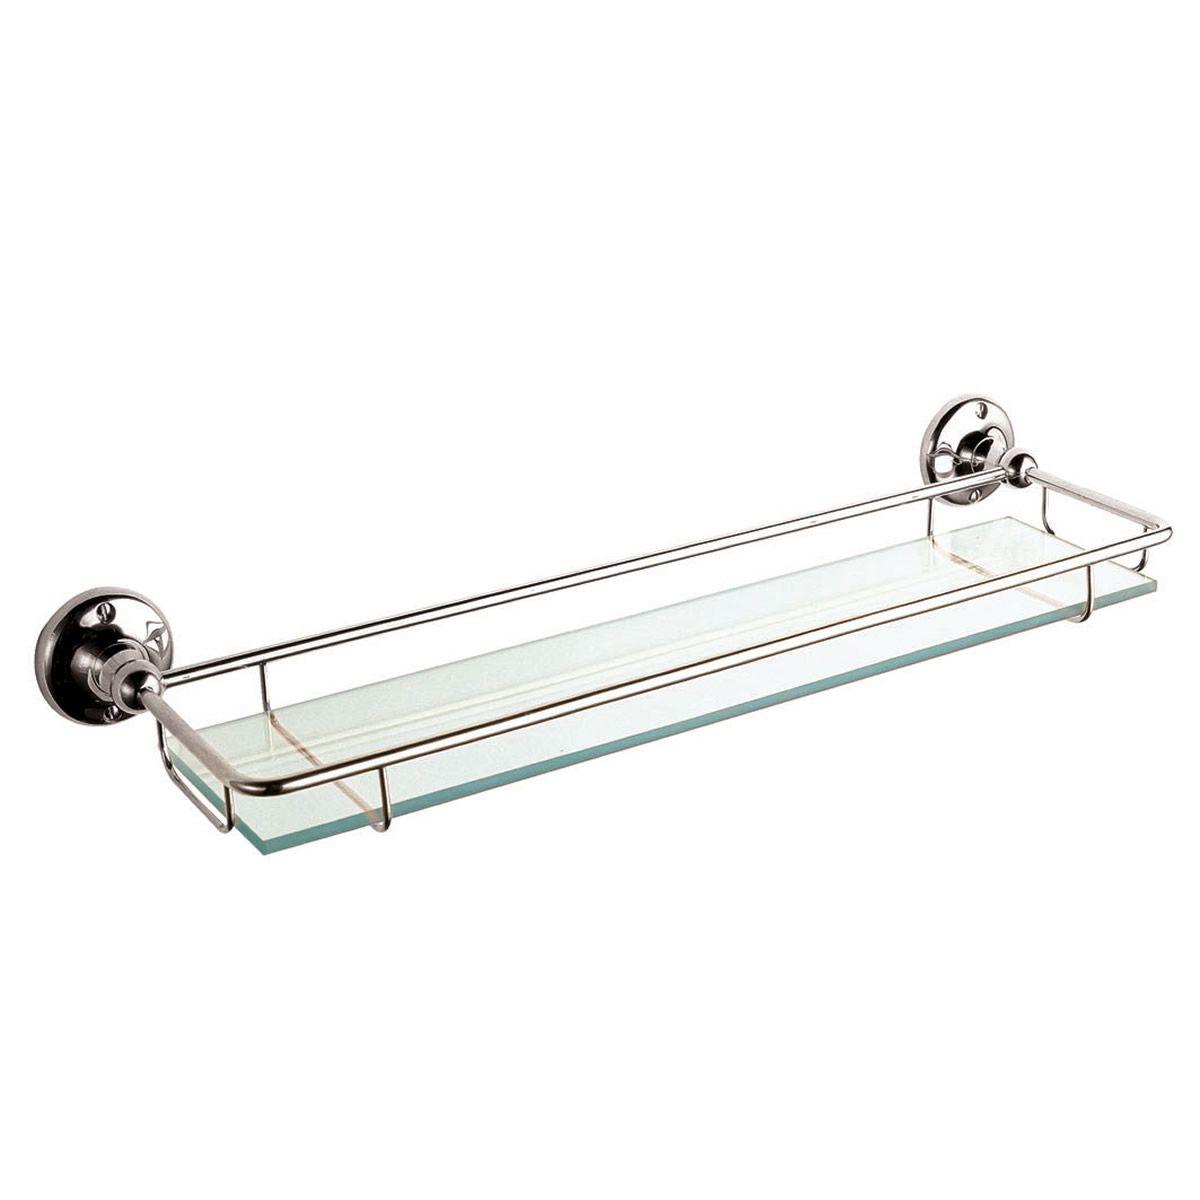 Bayswater Glass Gallery Shelf - BAYA011